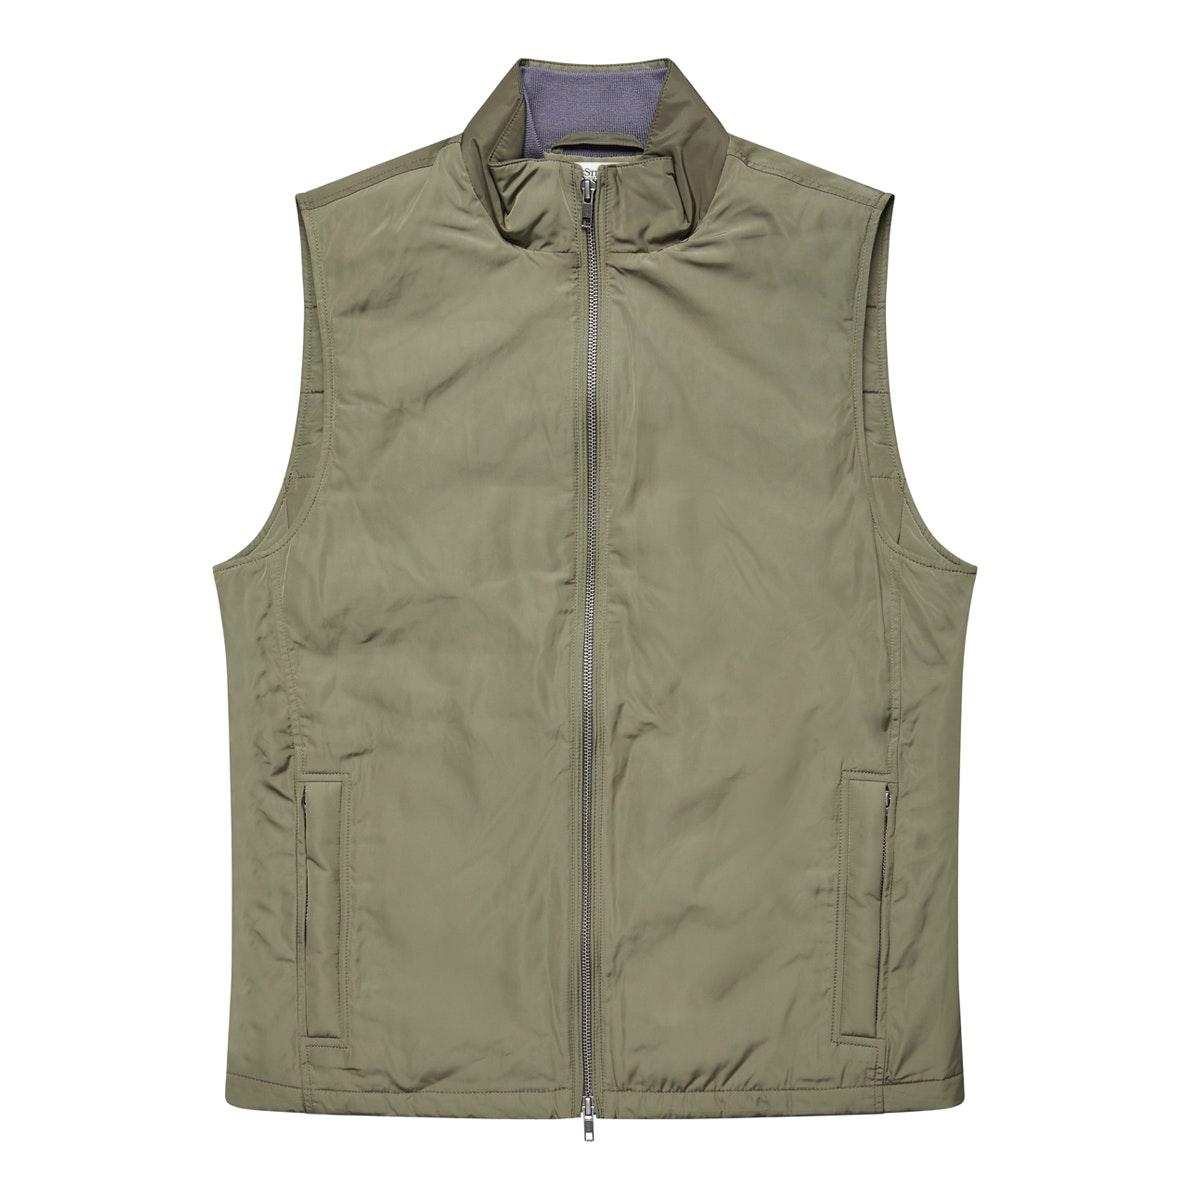 The Pemberton Olive Vest